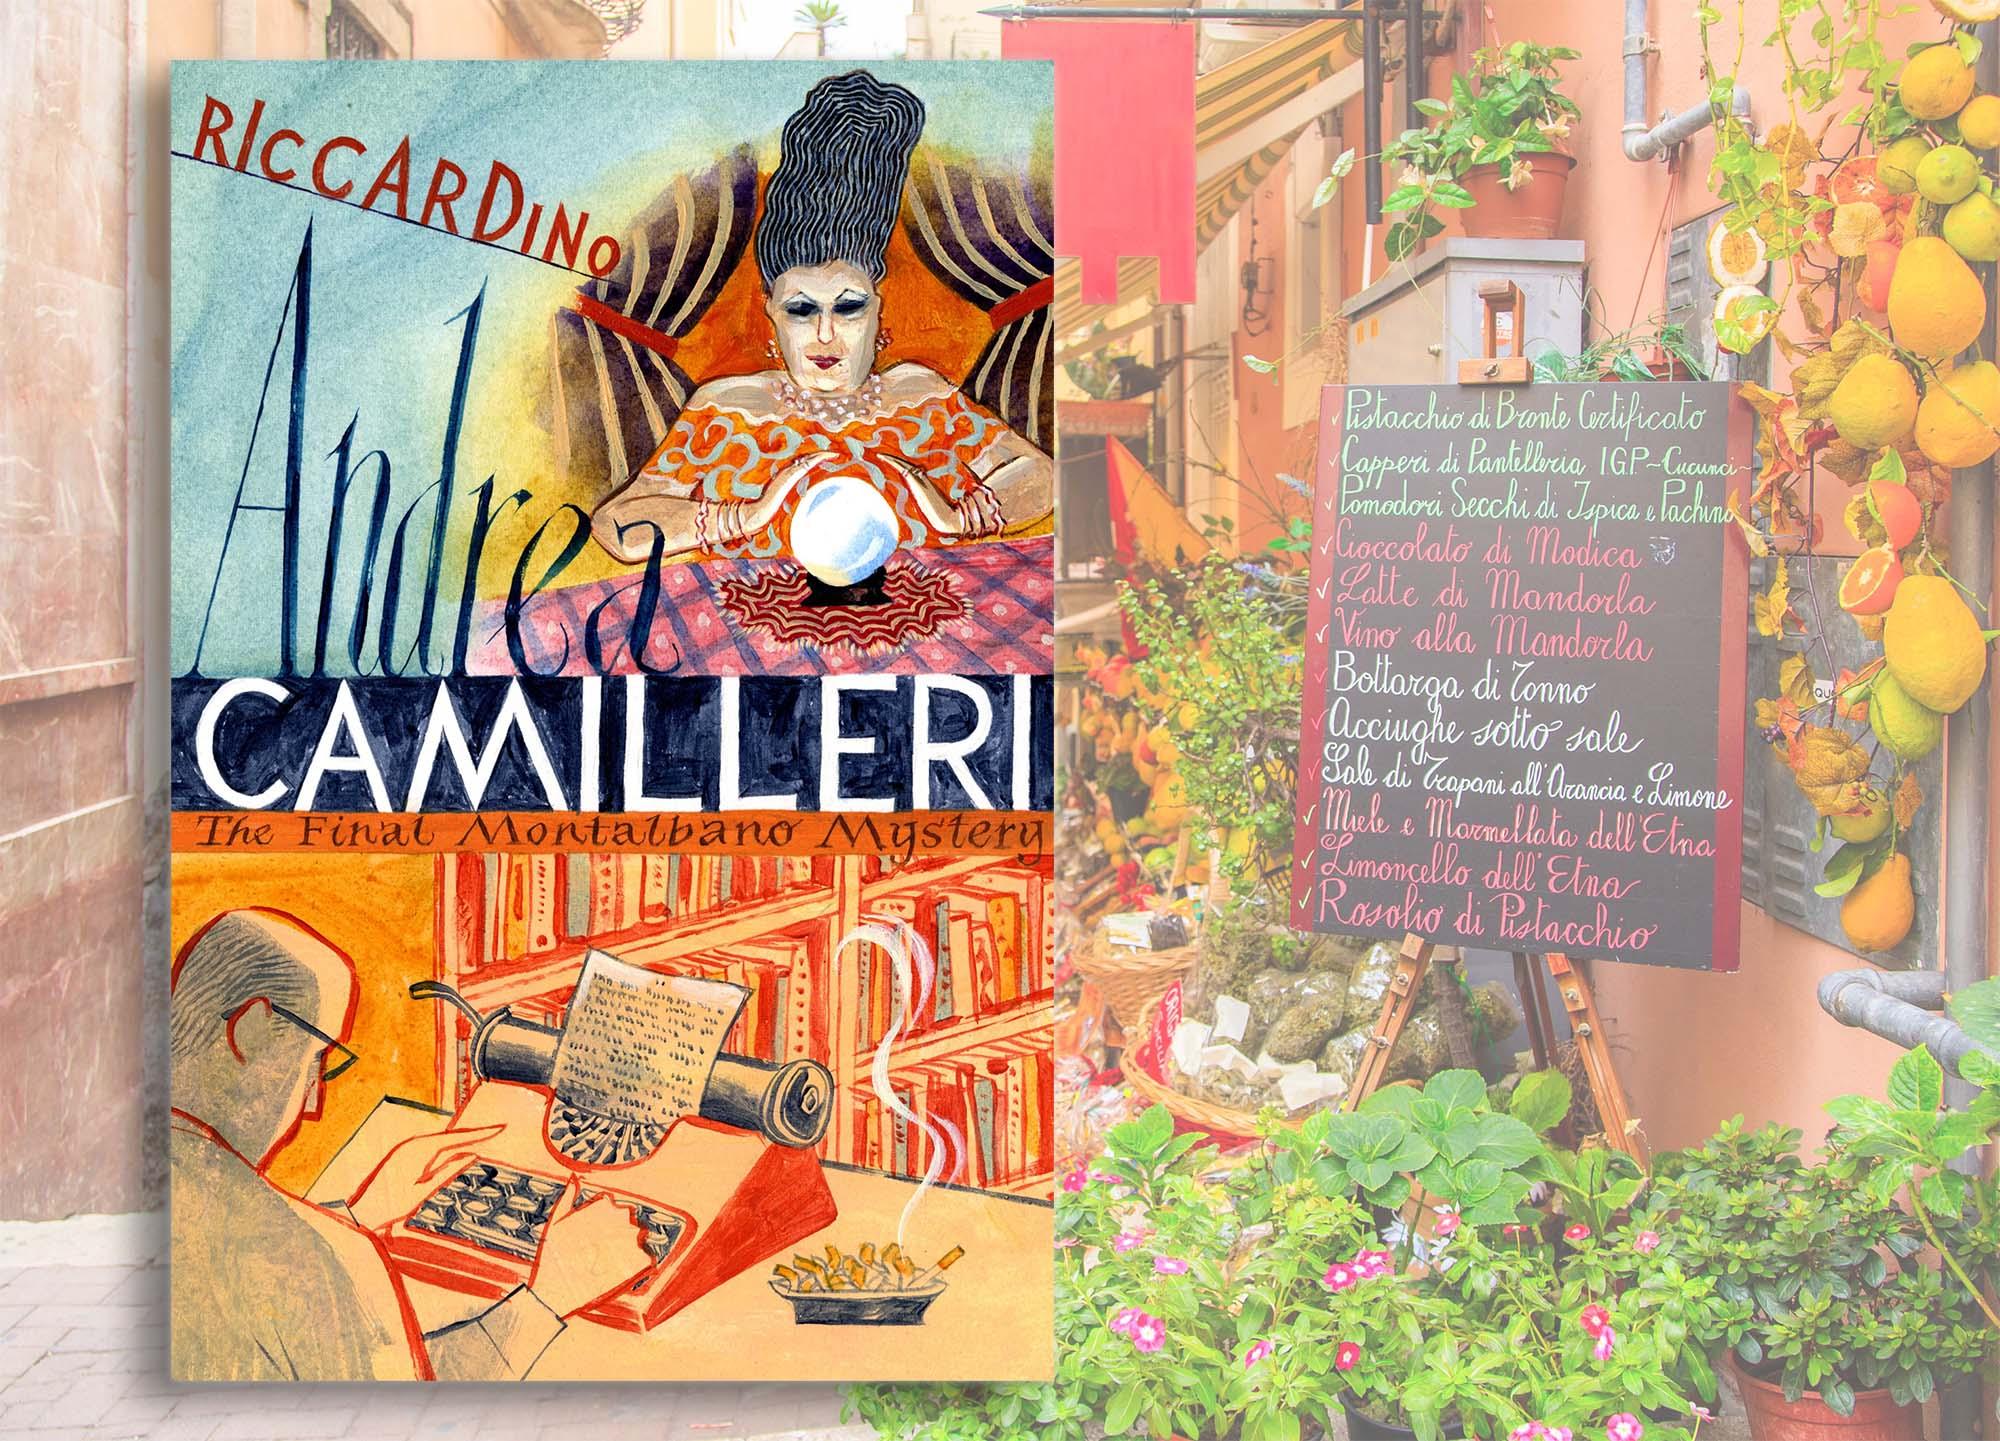 Riccardino by Andrea Camilleri next to a Sicilian restaurant with a blackboard menu